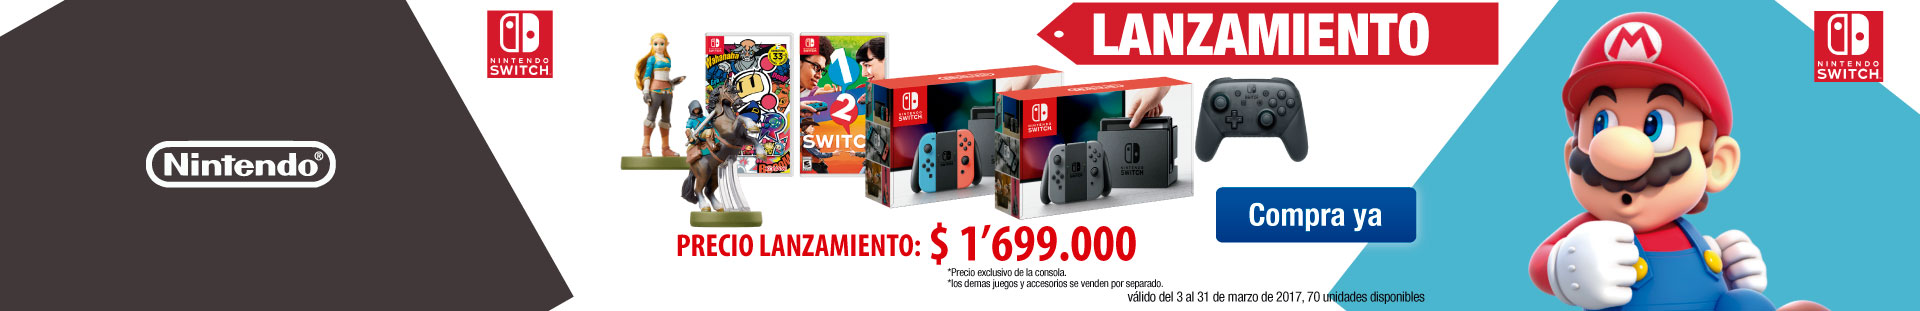 Categoria-lanzam-switch